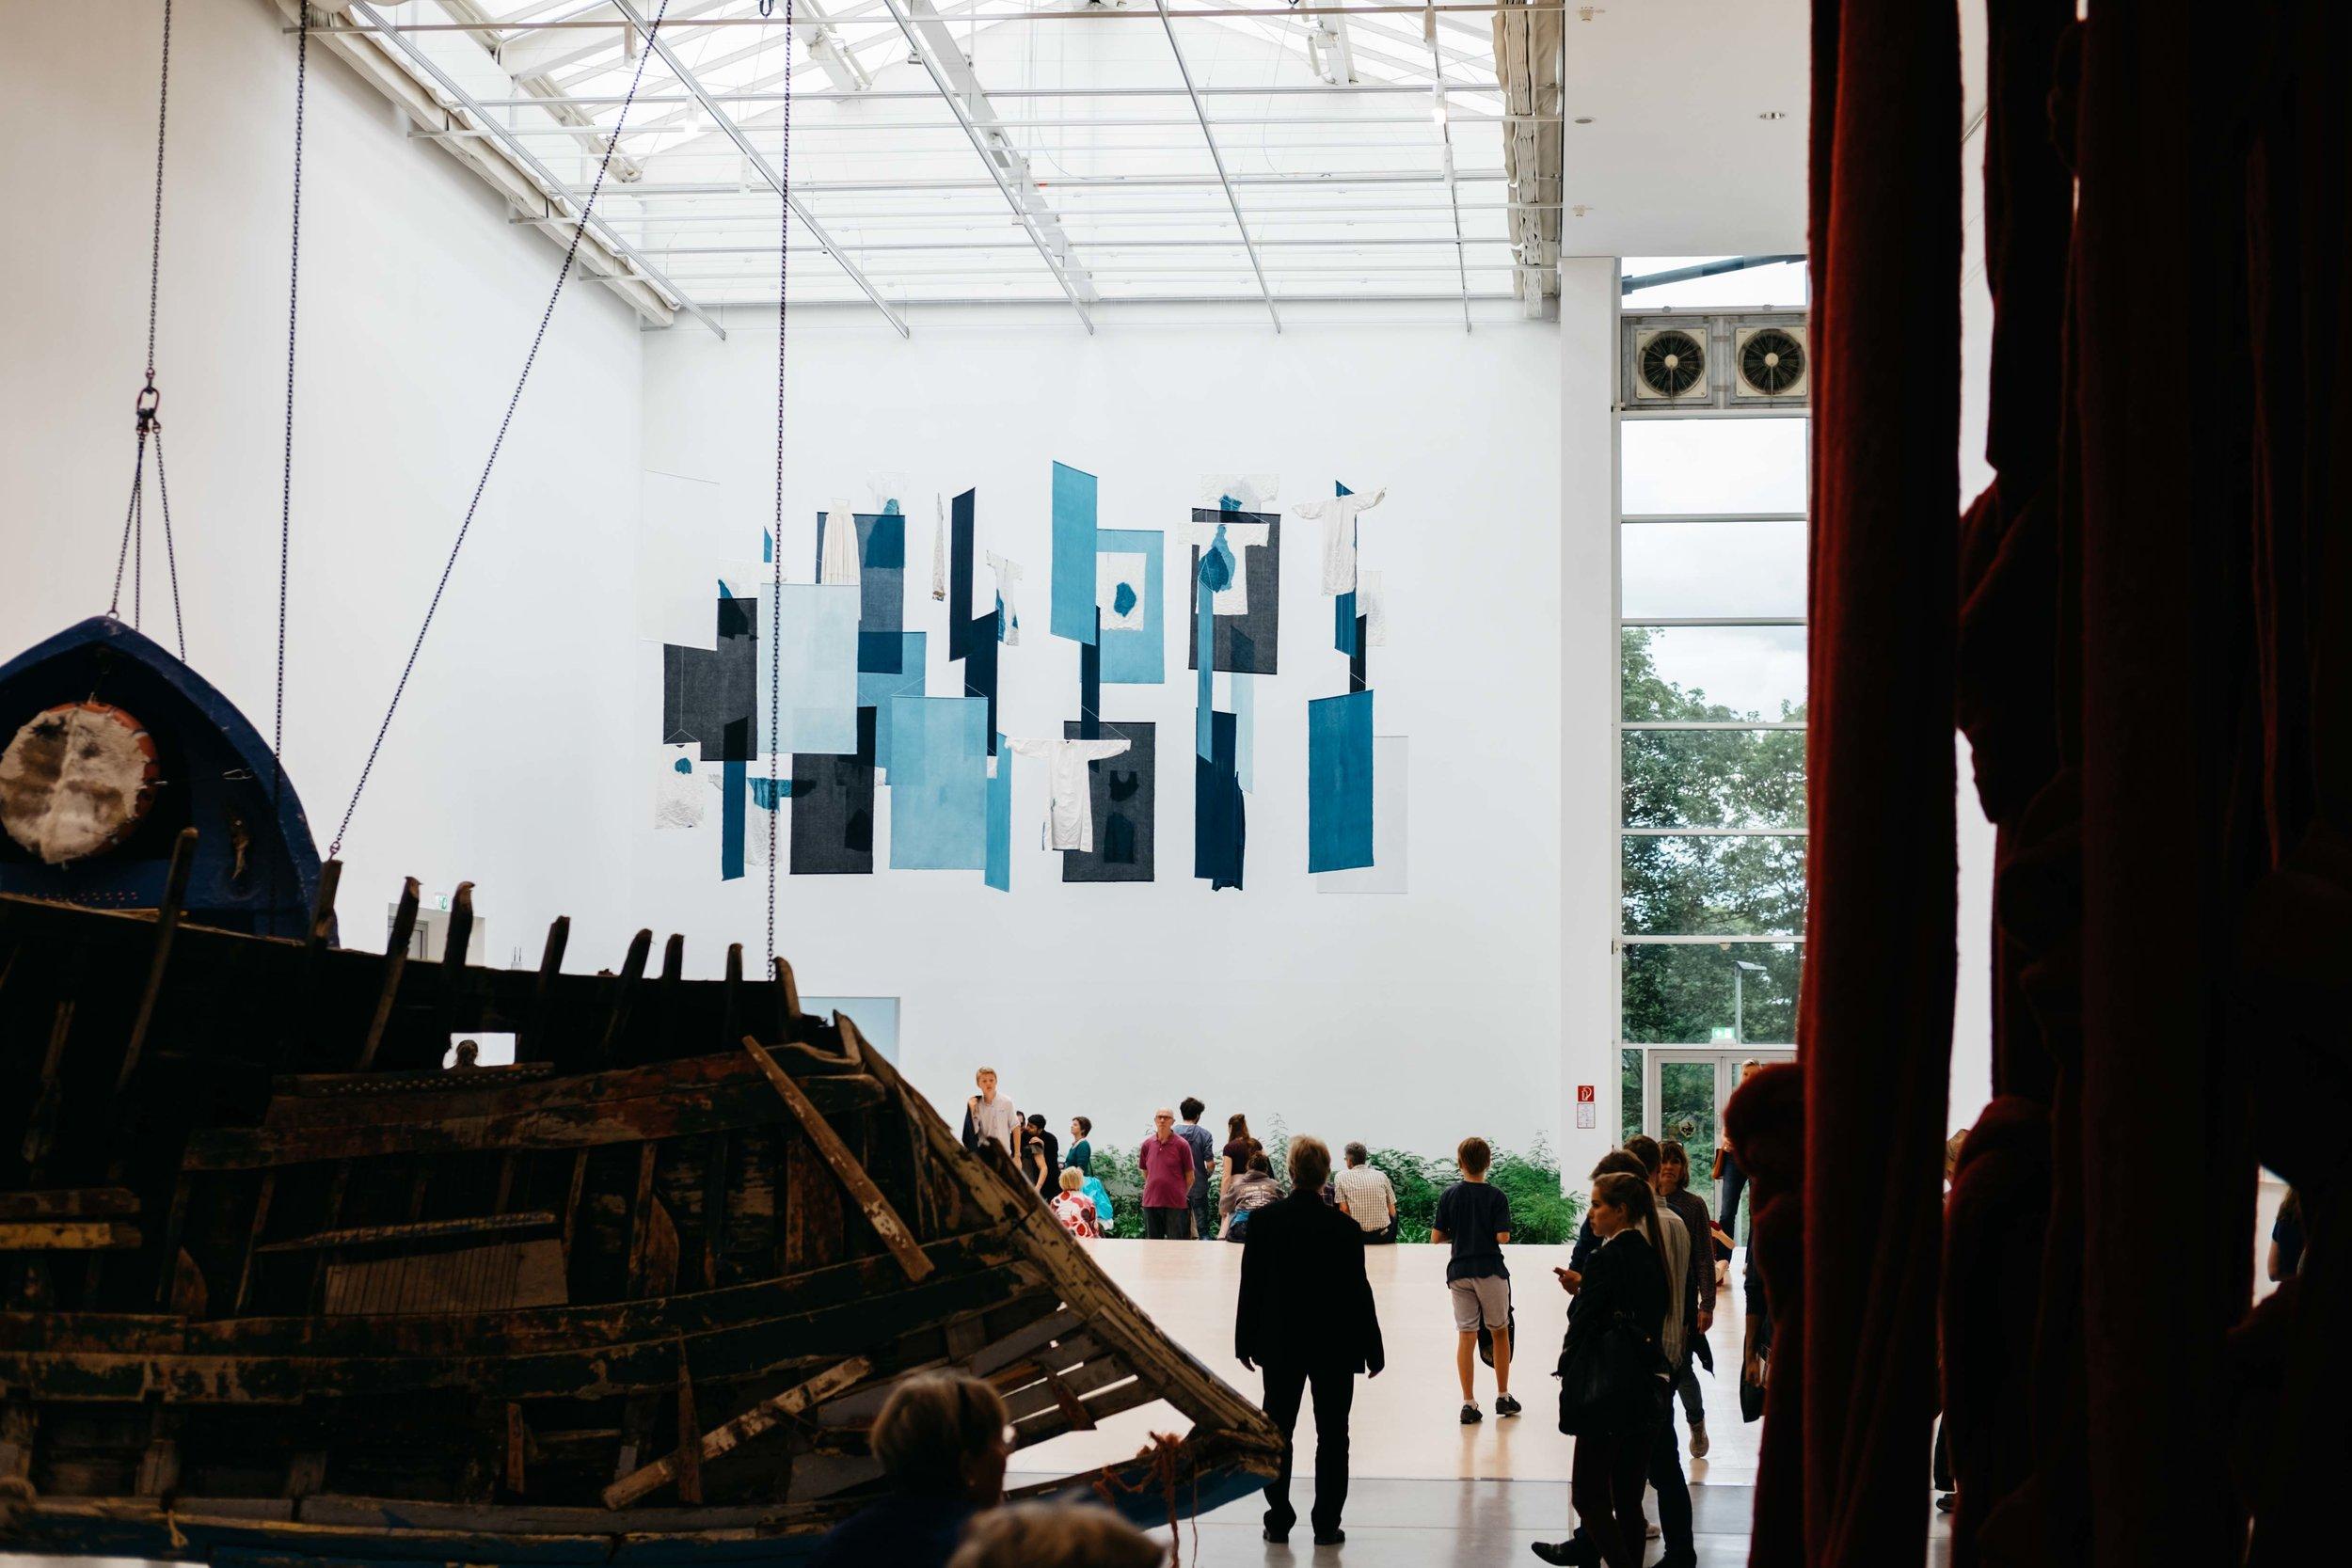 documenta14-kassel-kunst-wearecity-simonhariman-2017-104.jpg